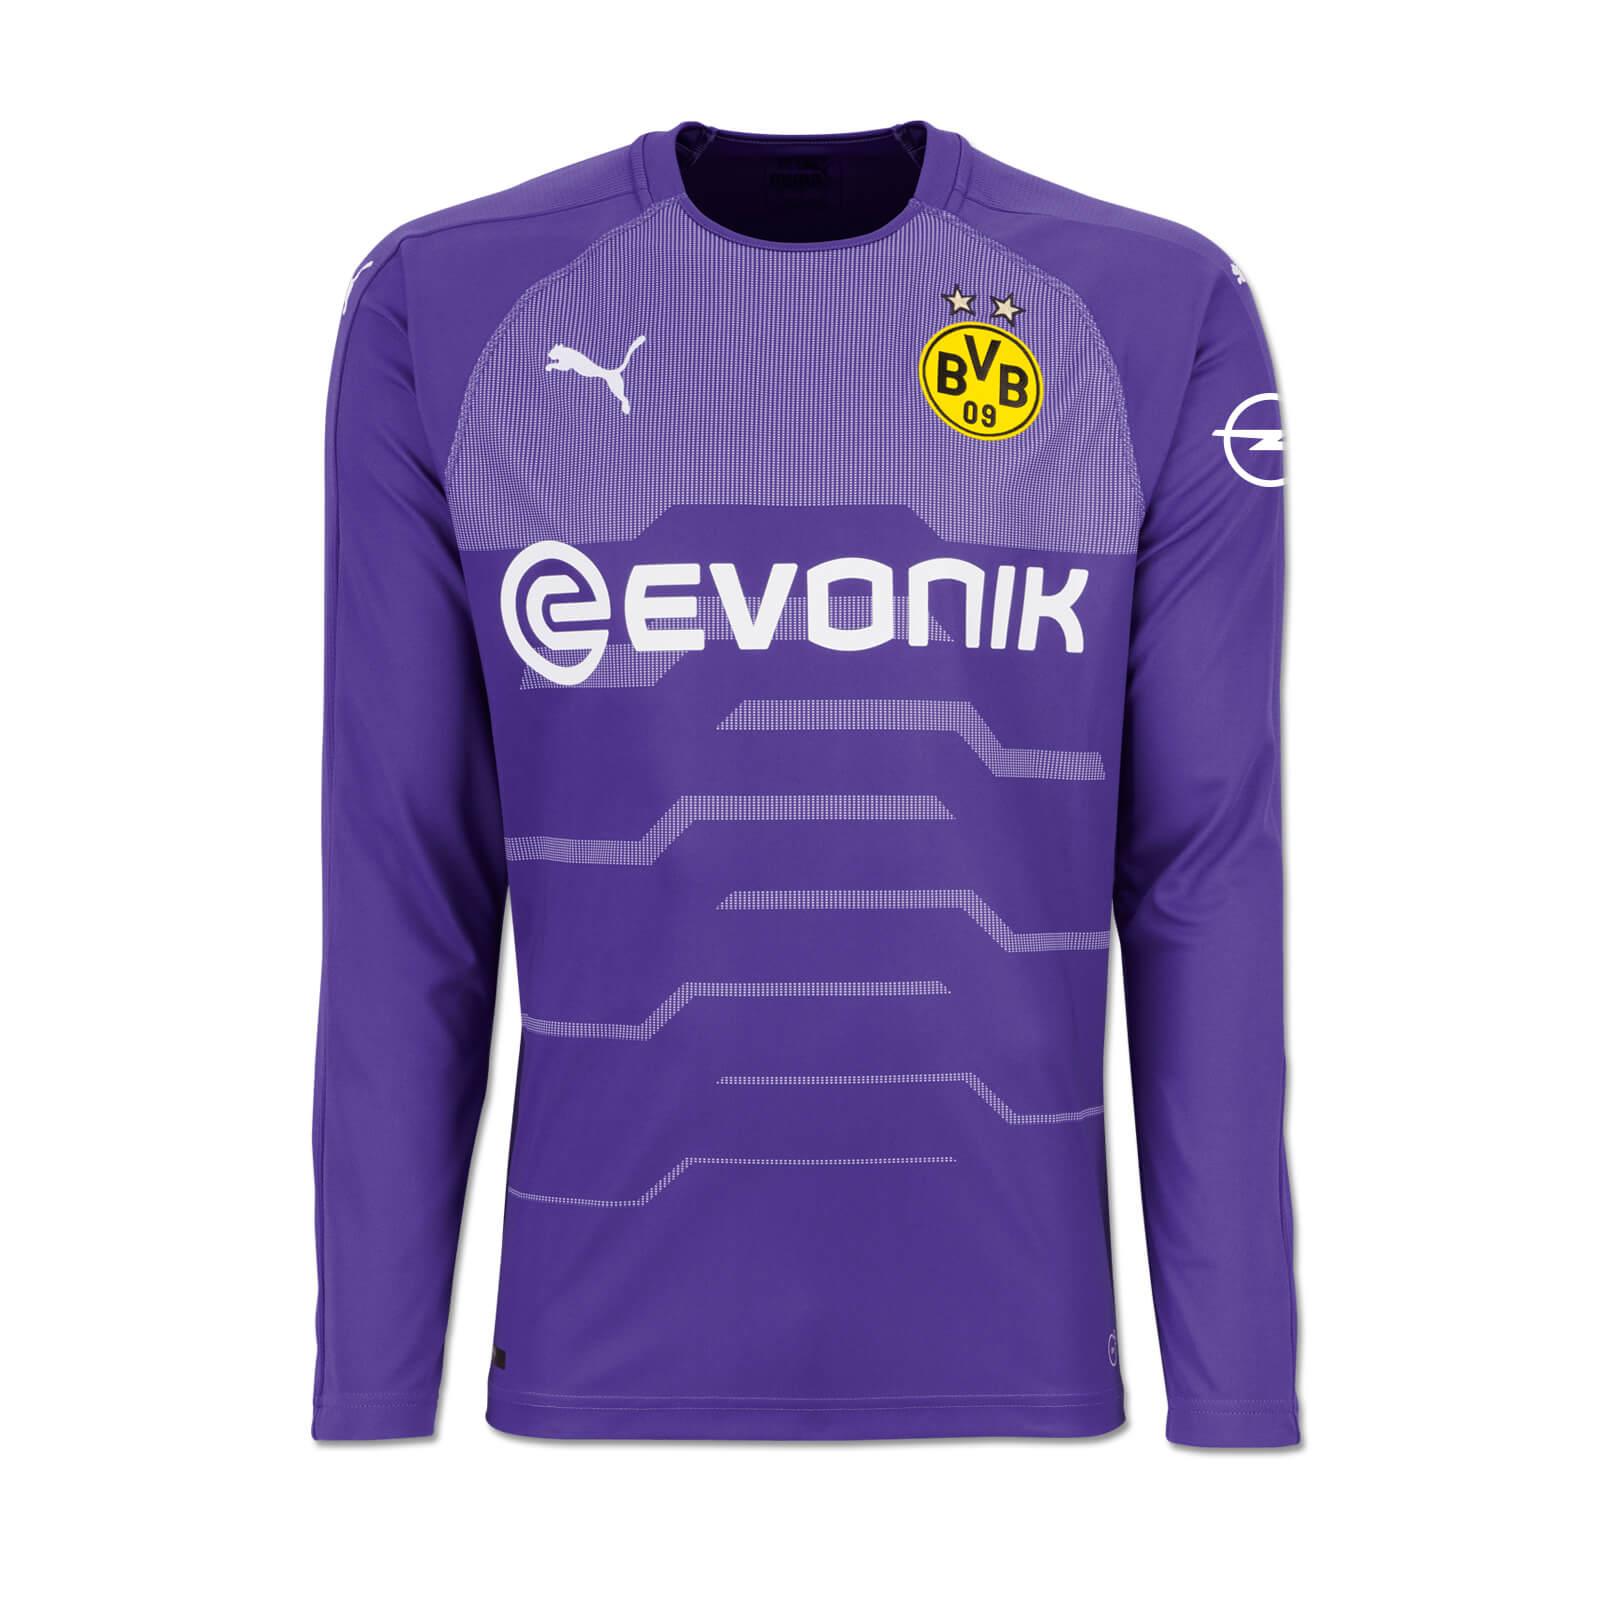 4331834b7 Borussia Dortmund Goalkeeper Jersey 2018-19 - violet